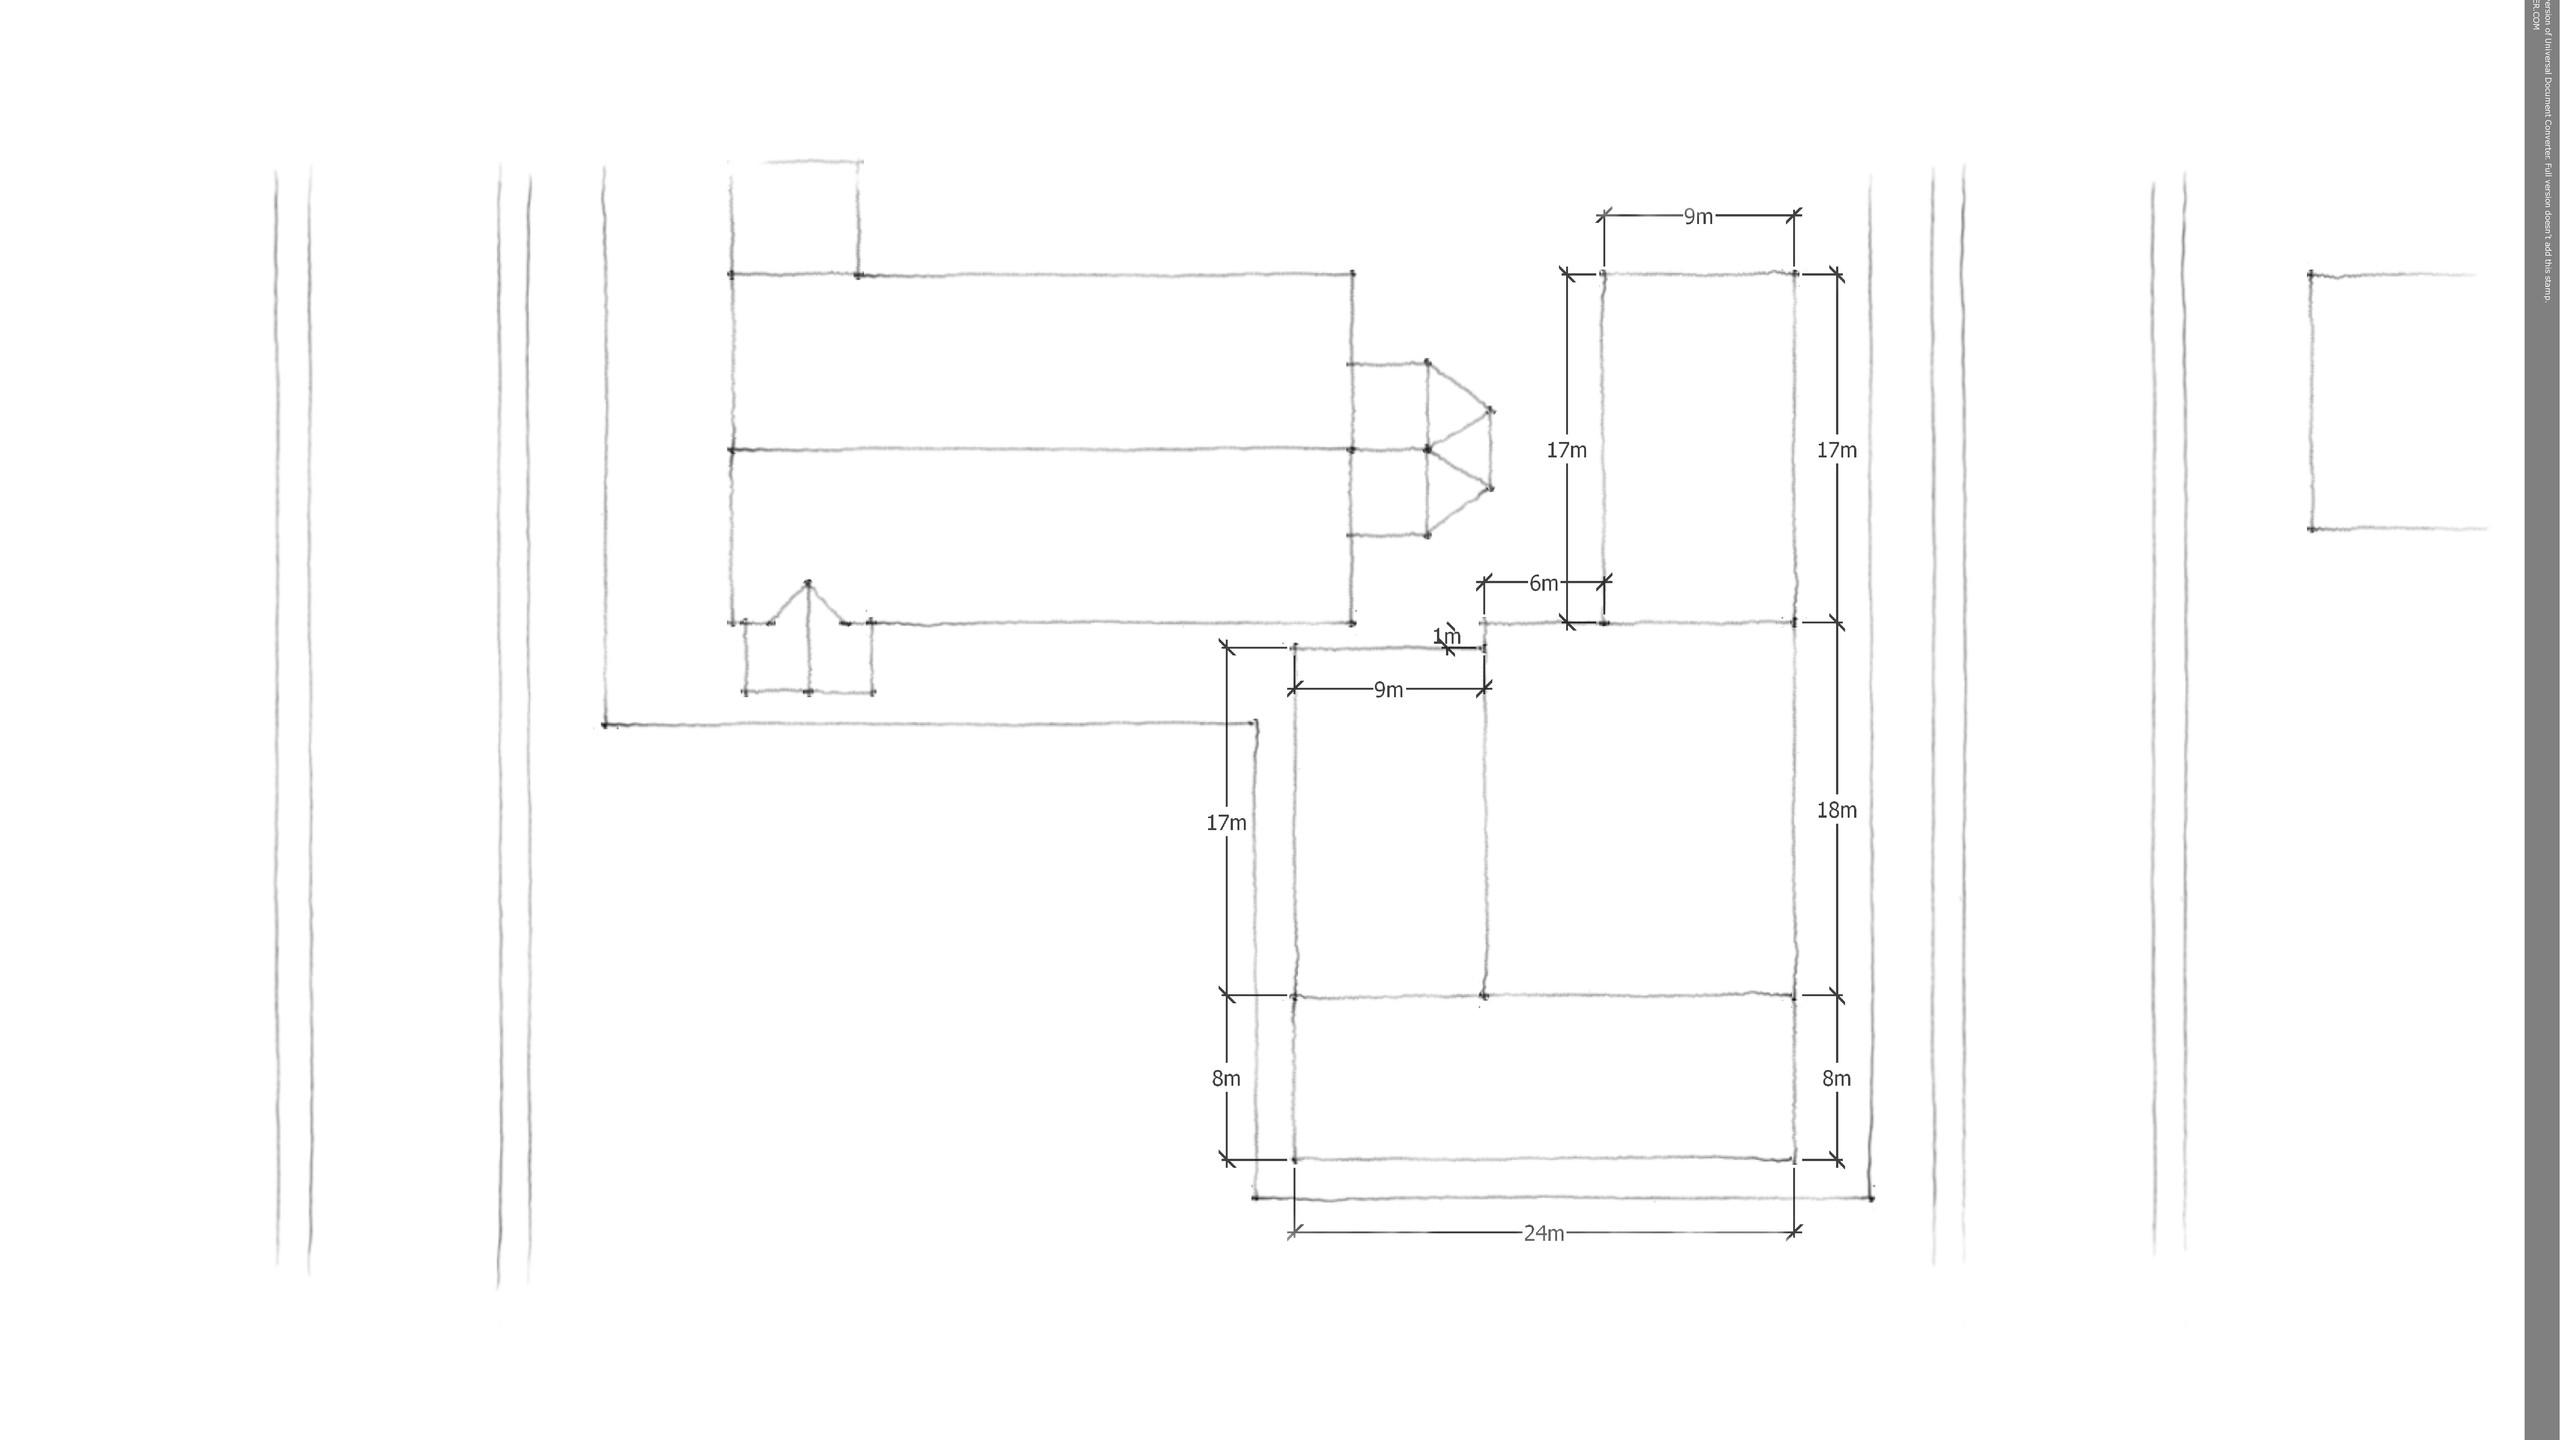 plan massing layout ideas b